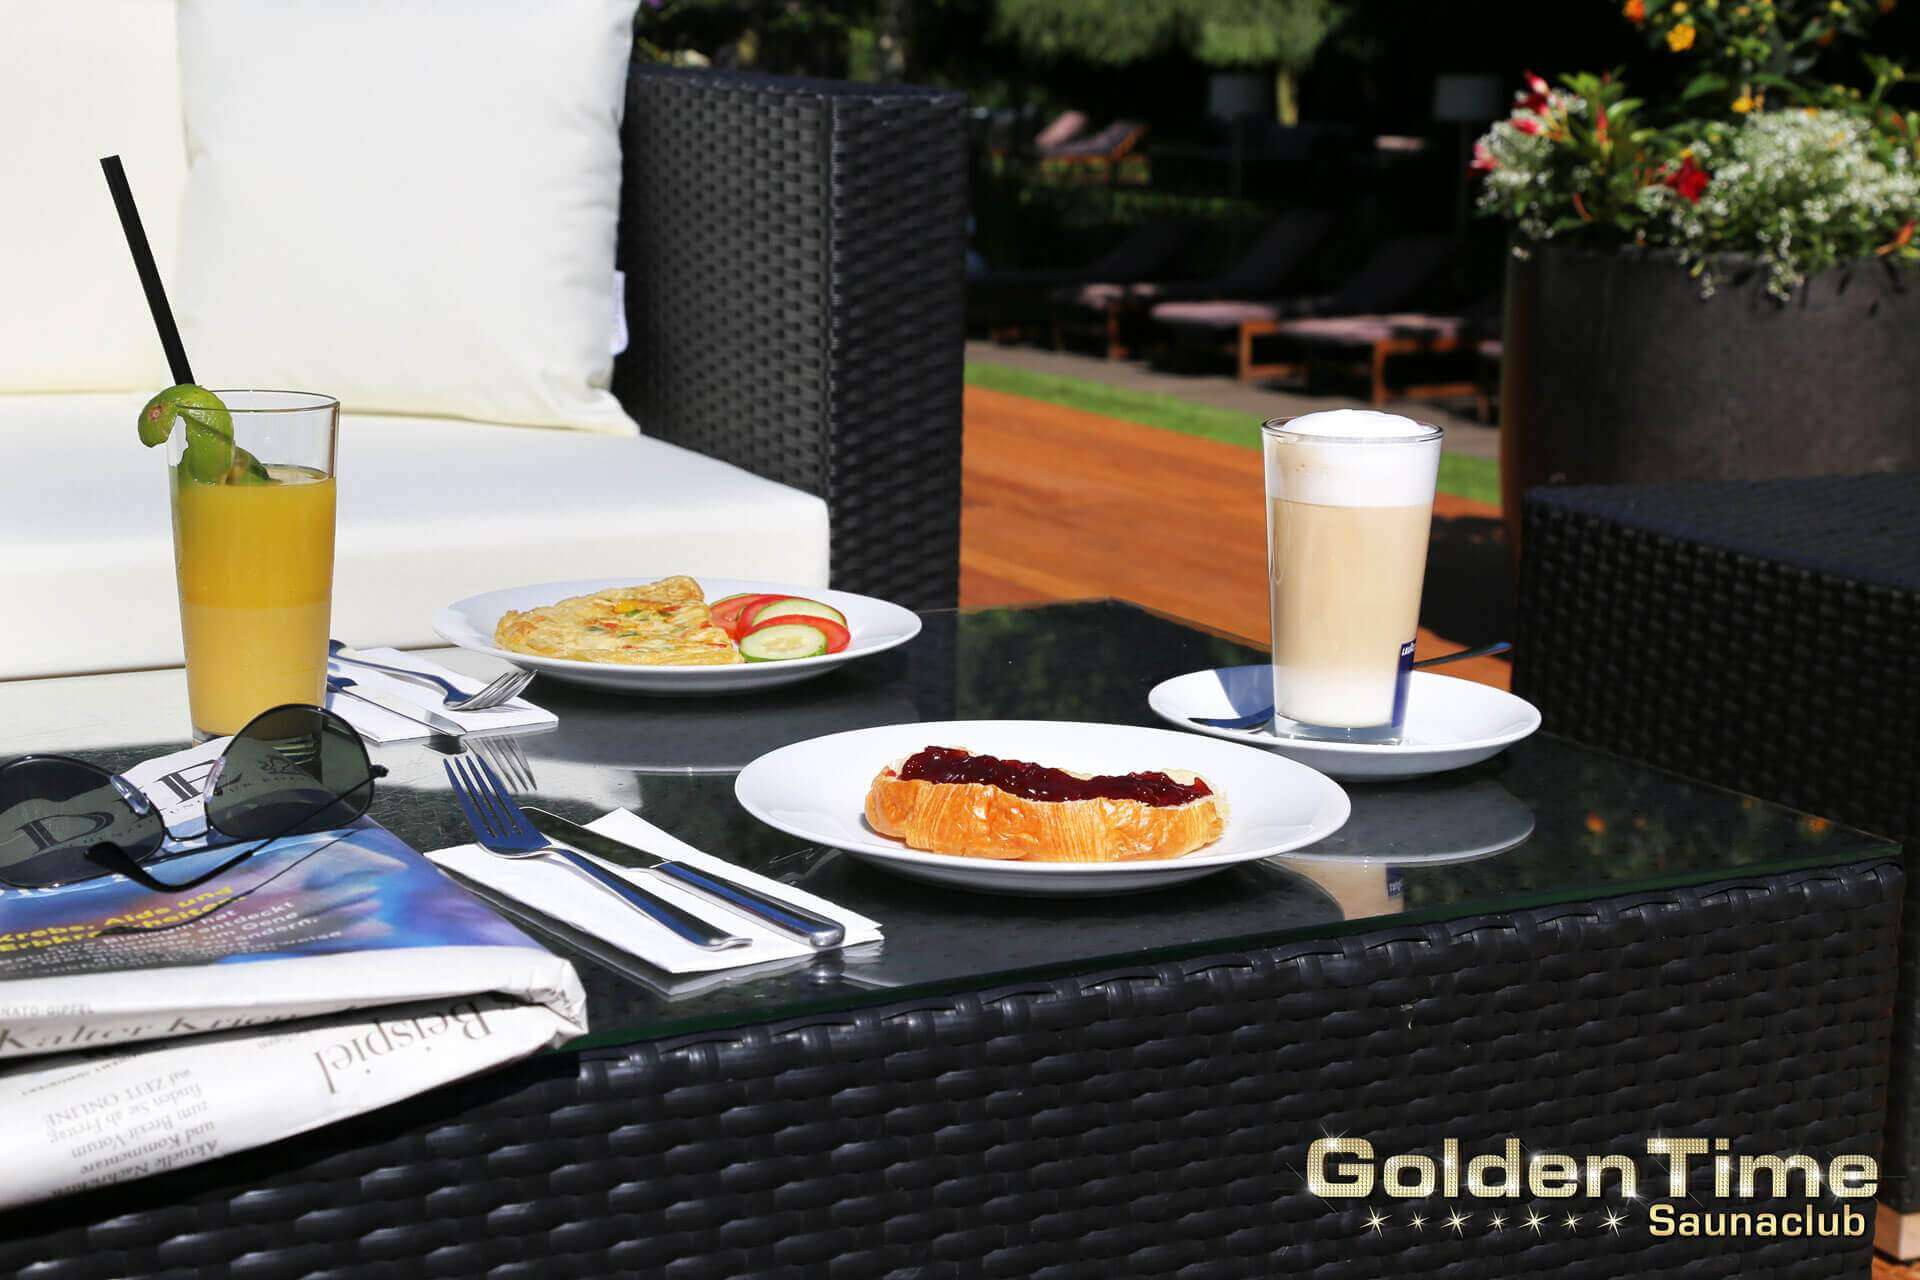 01-terrasse-pic-04-goldentime-saunaclub.jpg